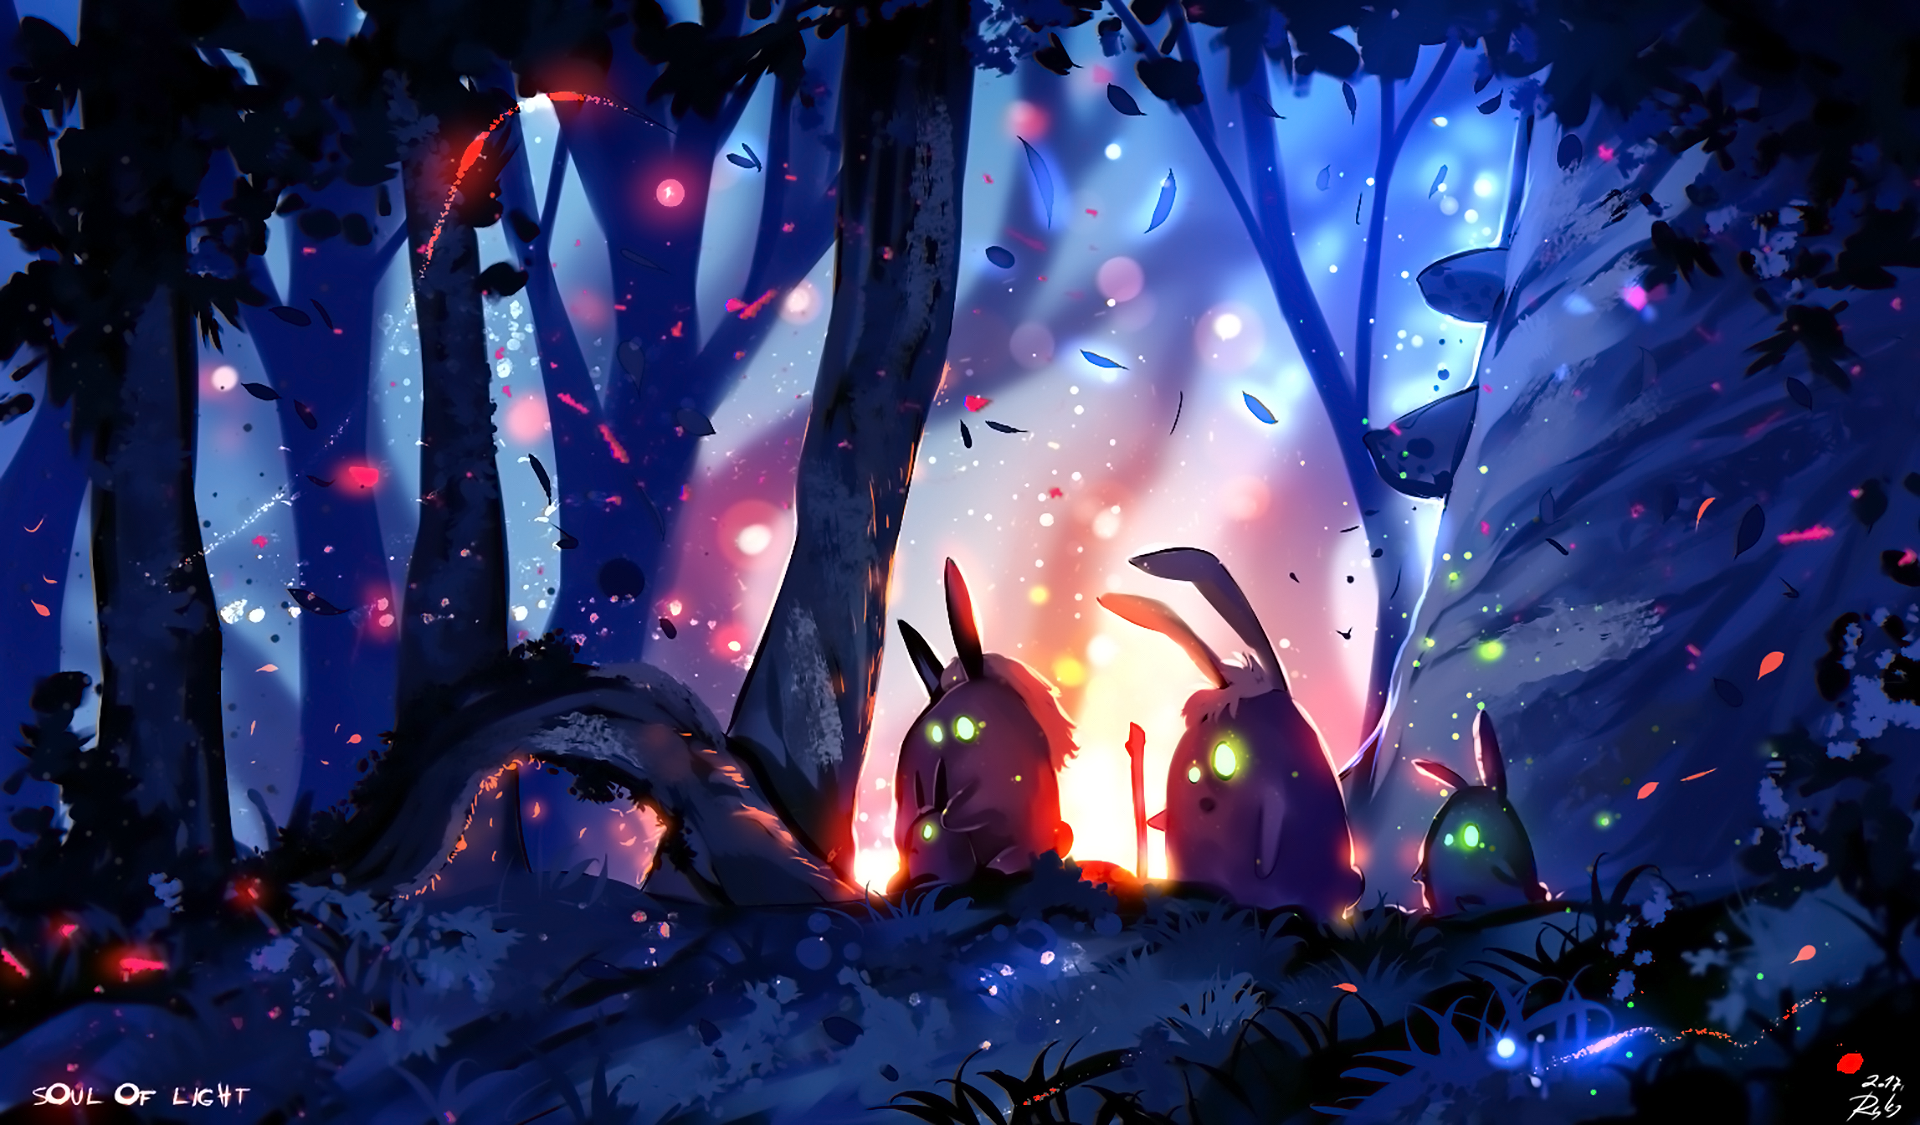 Bunny Light Tree Forest 1920x1125